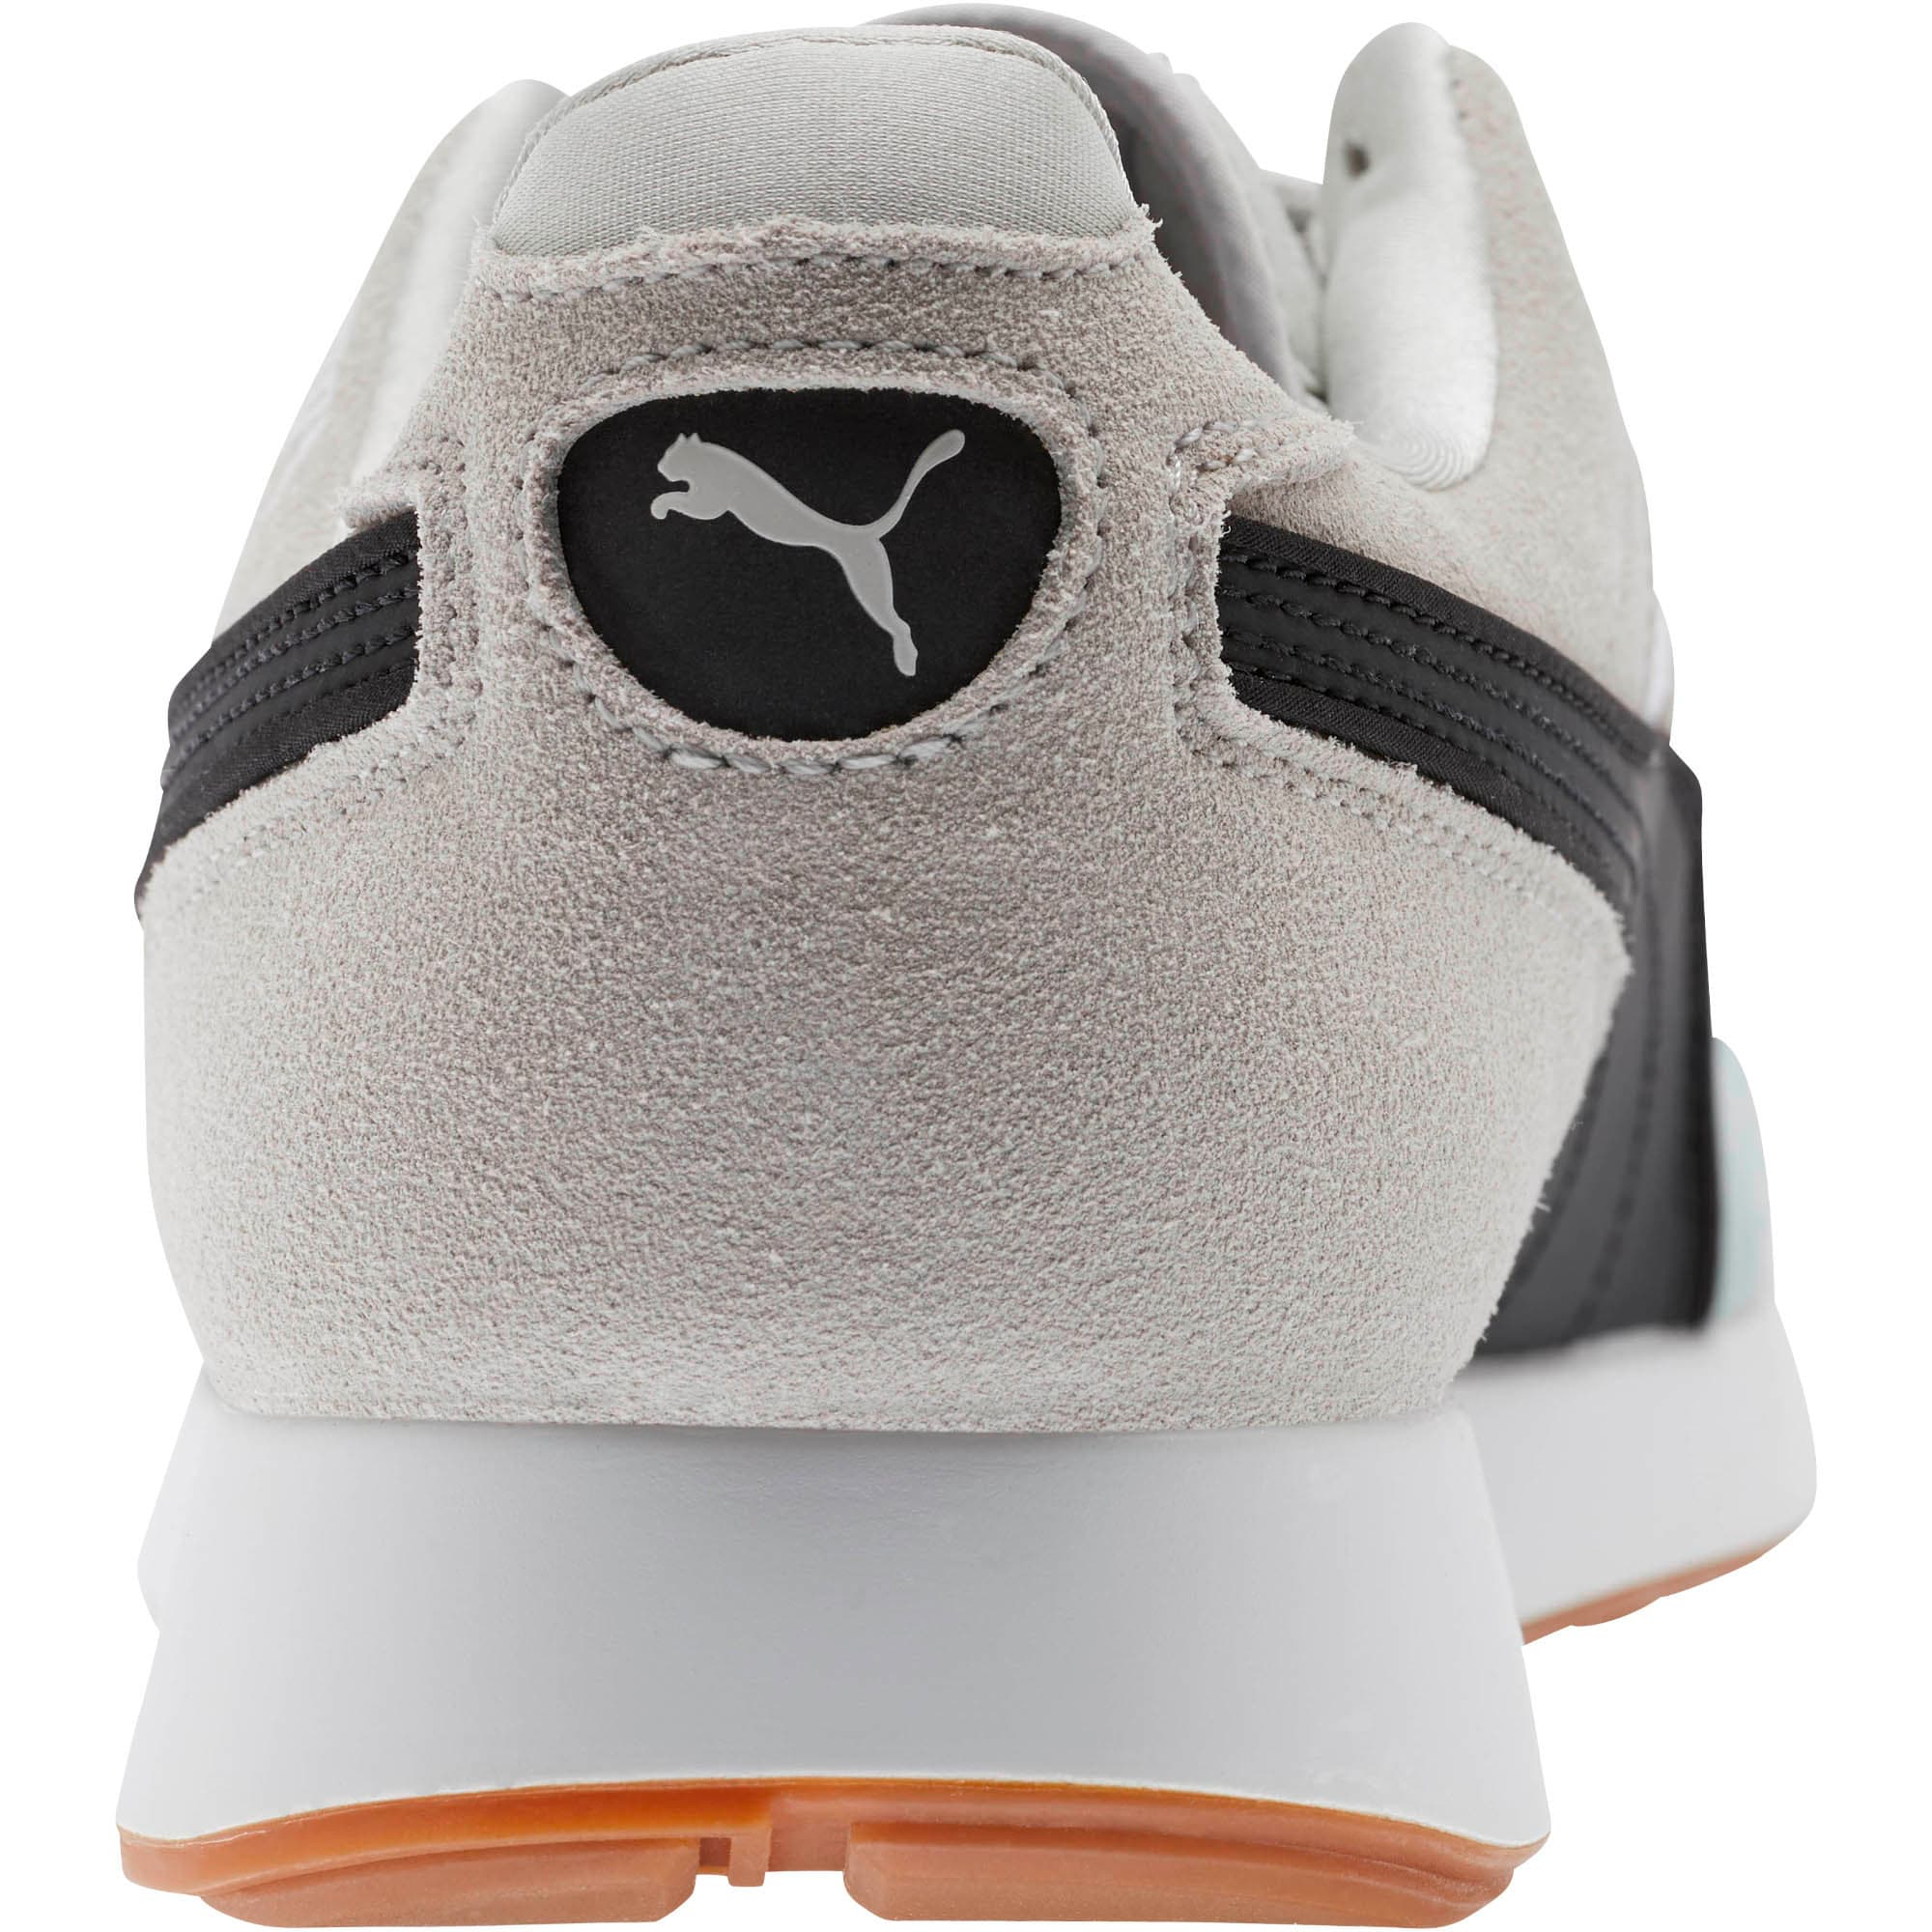 Miniatura 3 de Zapatos deportivos RS-100 Racing Flag, Glacier Gray-Puma White, mediano